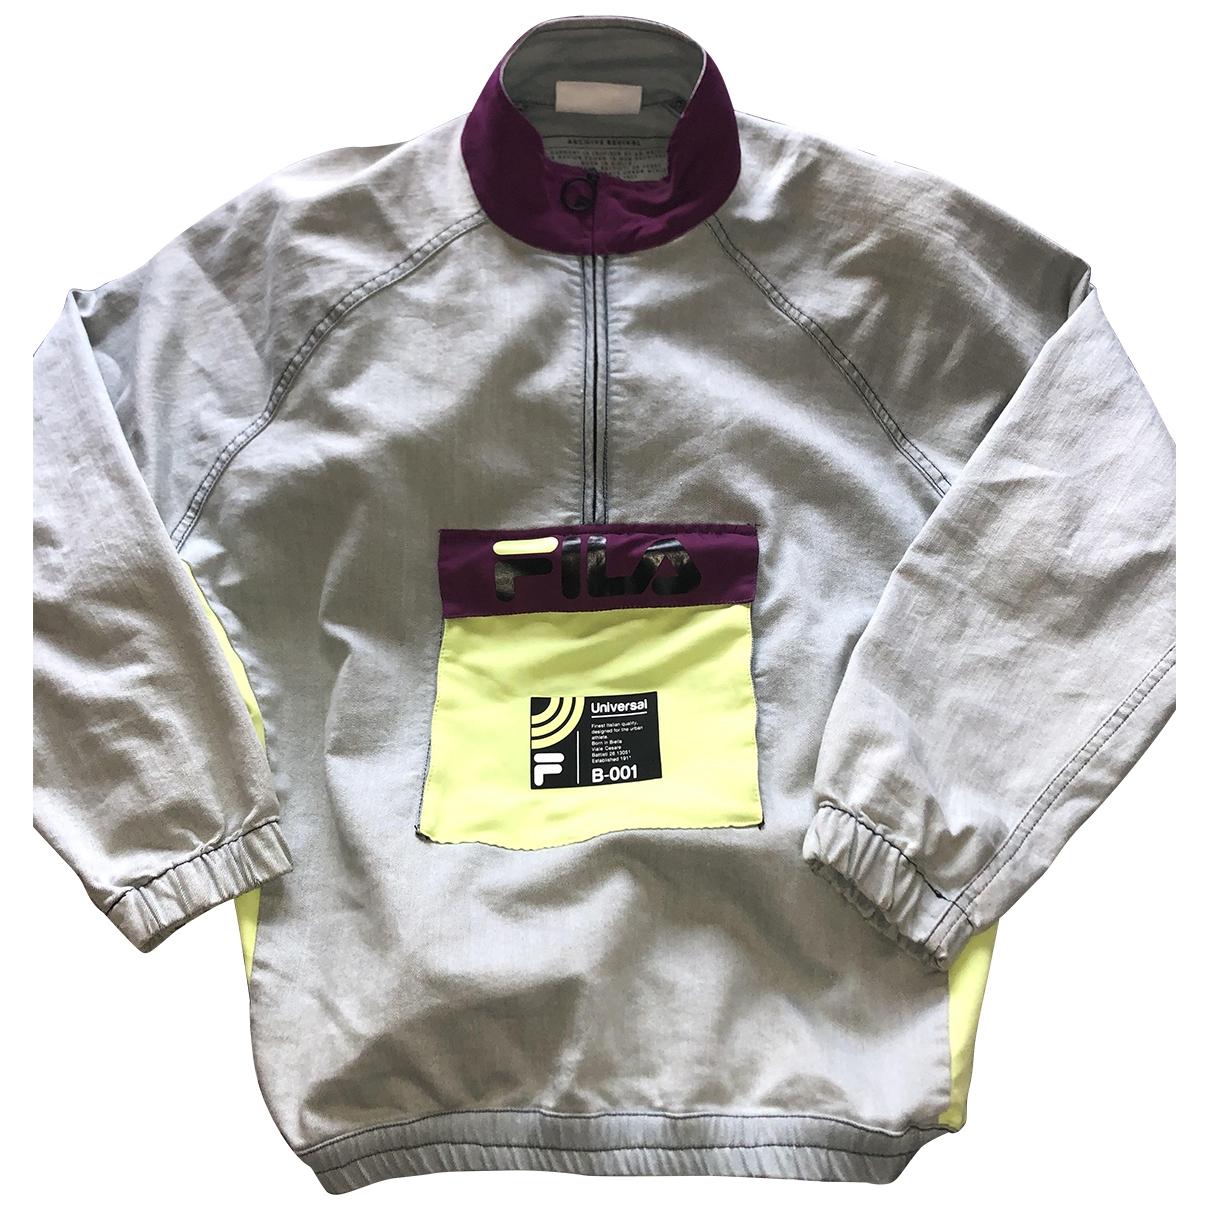 Fila \N Denim - Jeans jacket  for Men M International